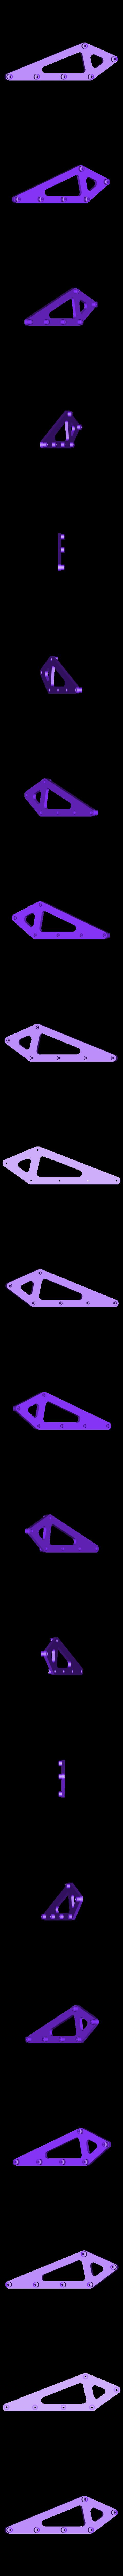 Versteifung.stl Download STL file RC Speed Tank • 3D printable design, Bryant